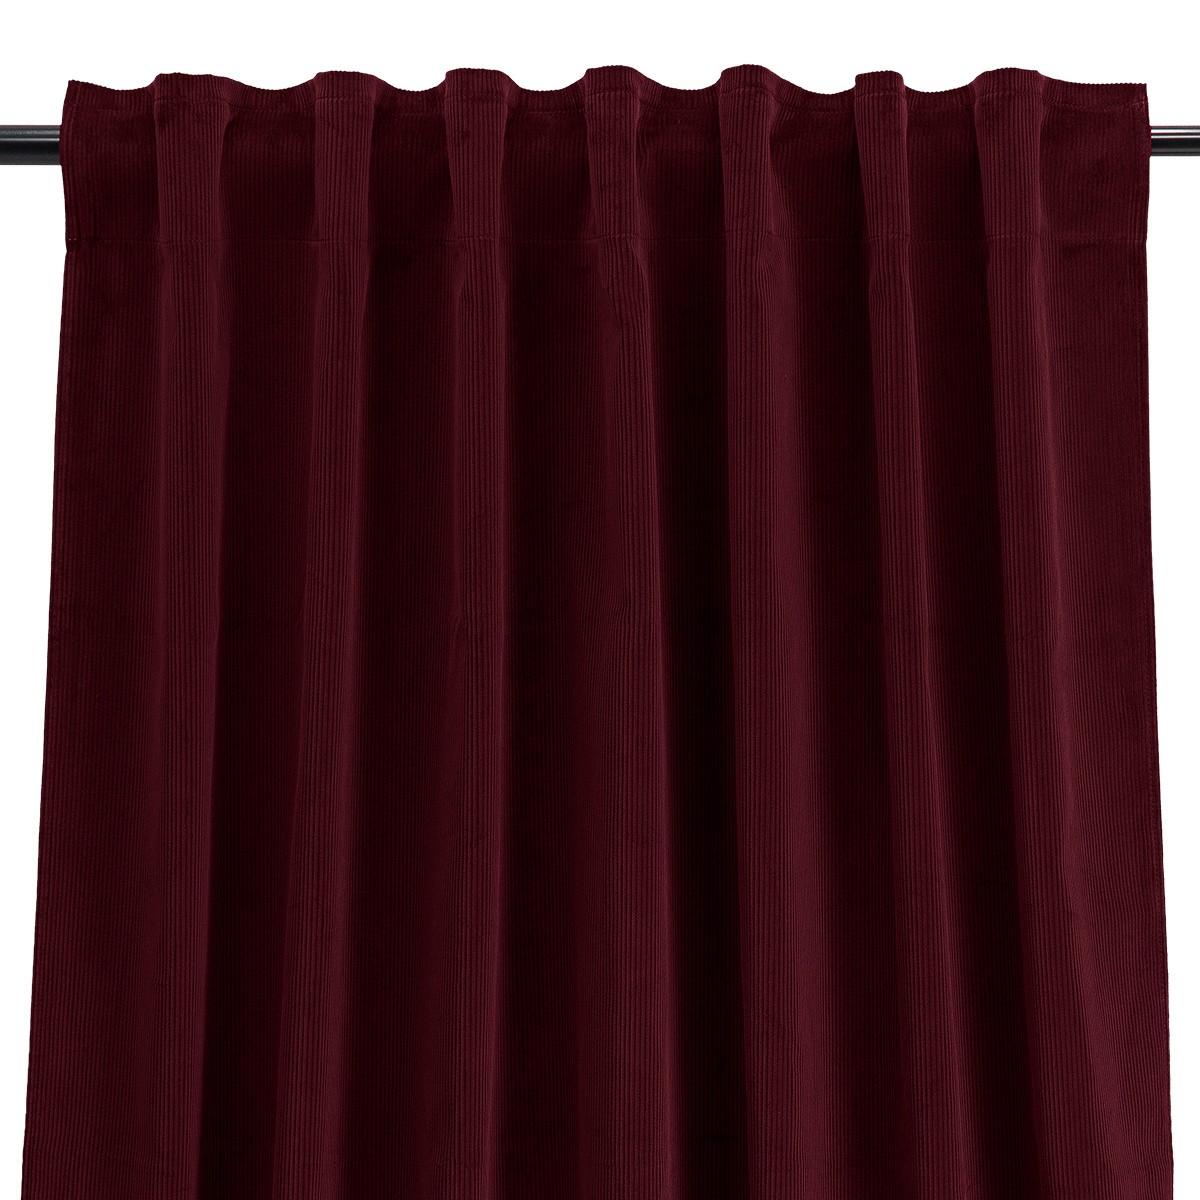 Palazzo Curtain, Plum-Colour